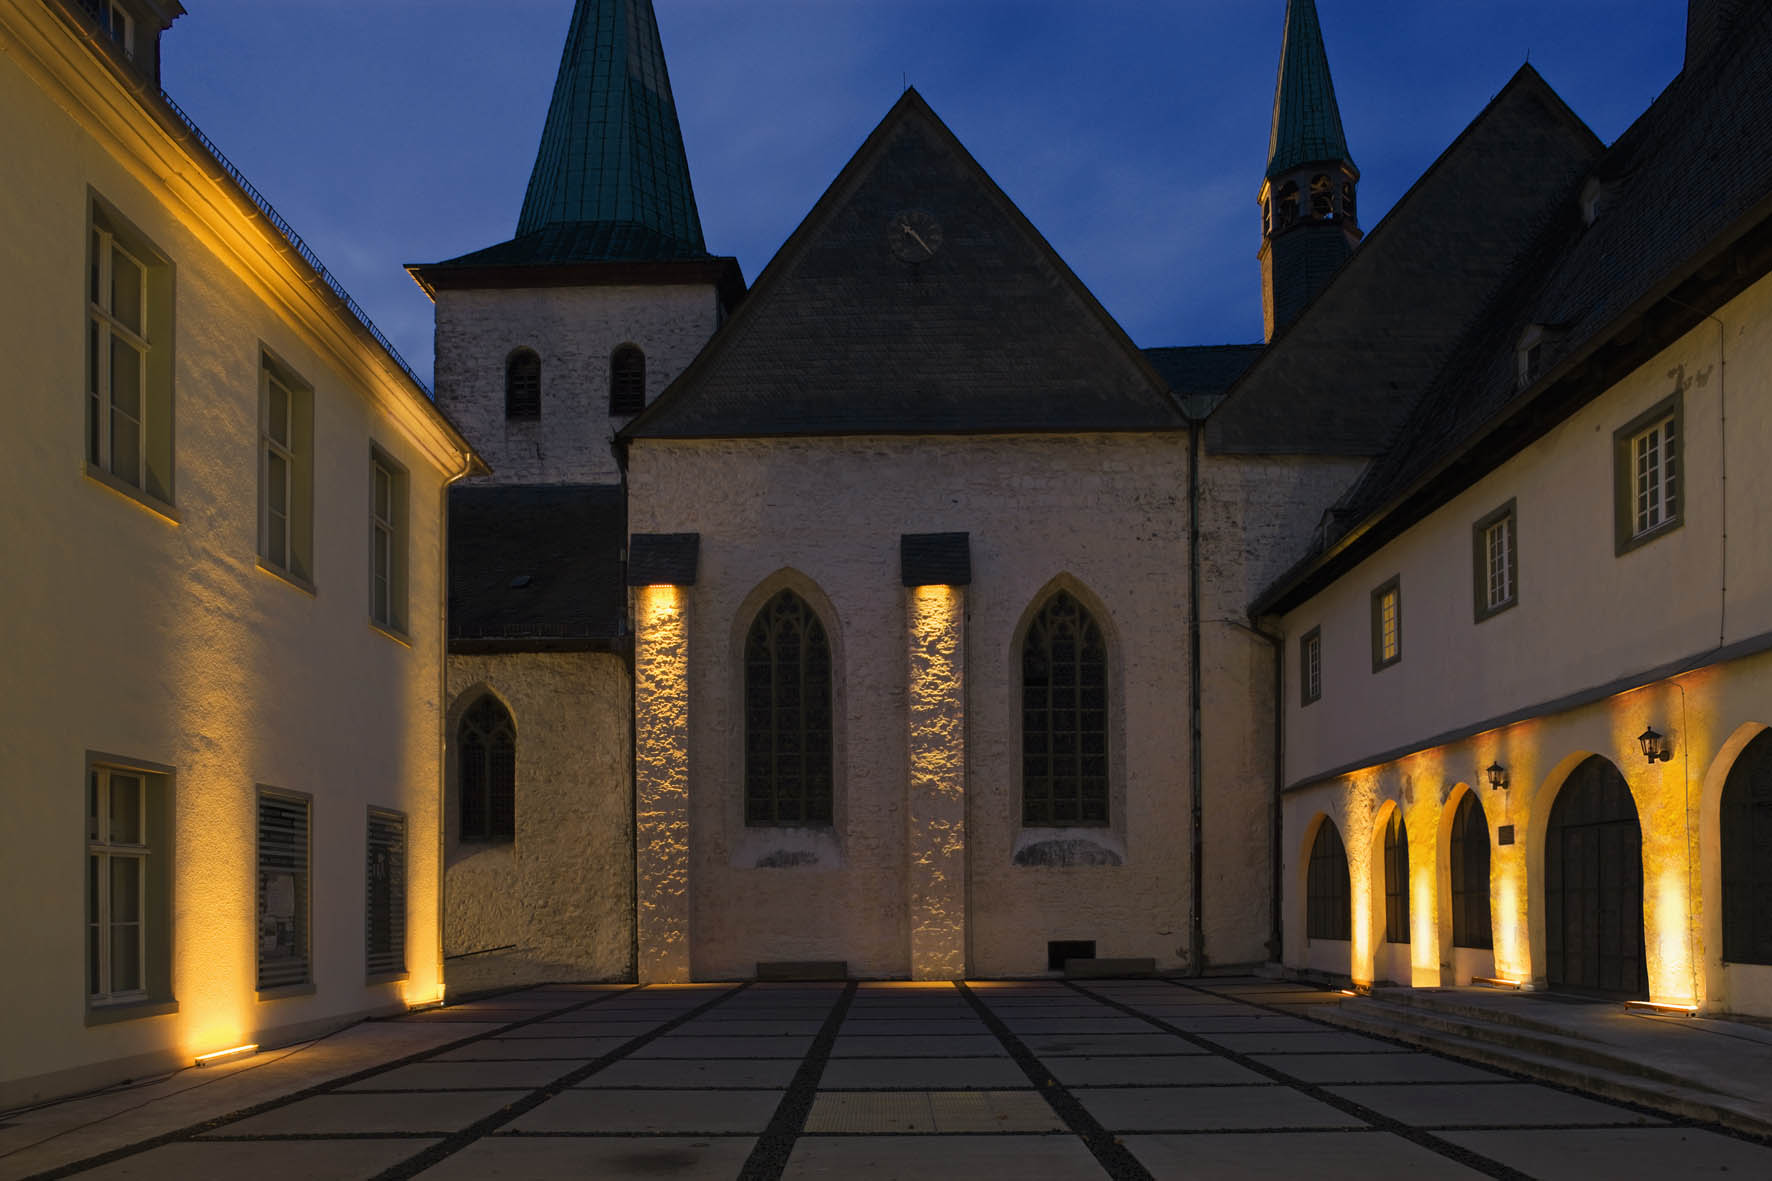 Kloster Wedinghausen, Stadtbesetzung Arnsberg, Fotonachweis: Boris Golz, Arnsberg